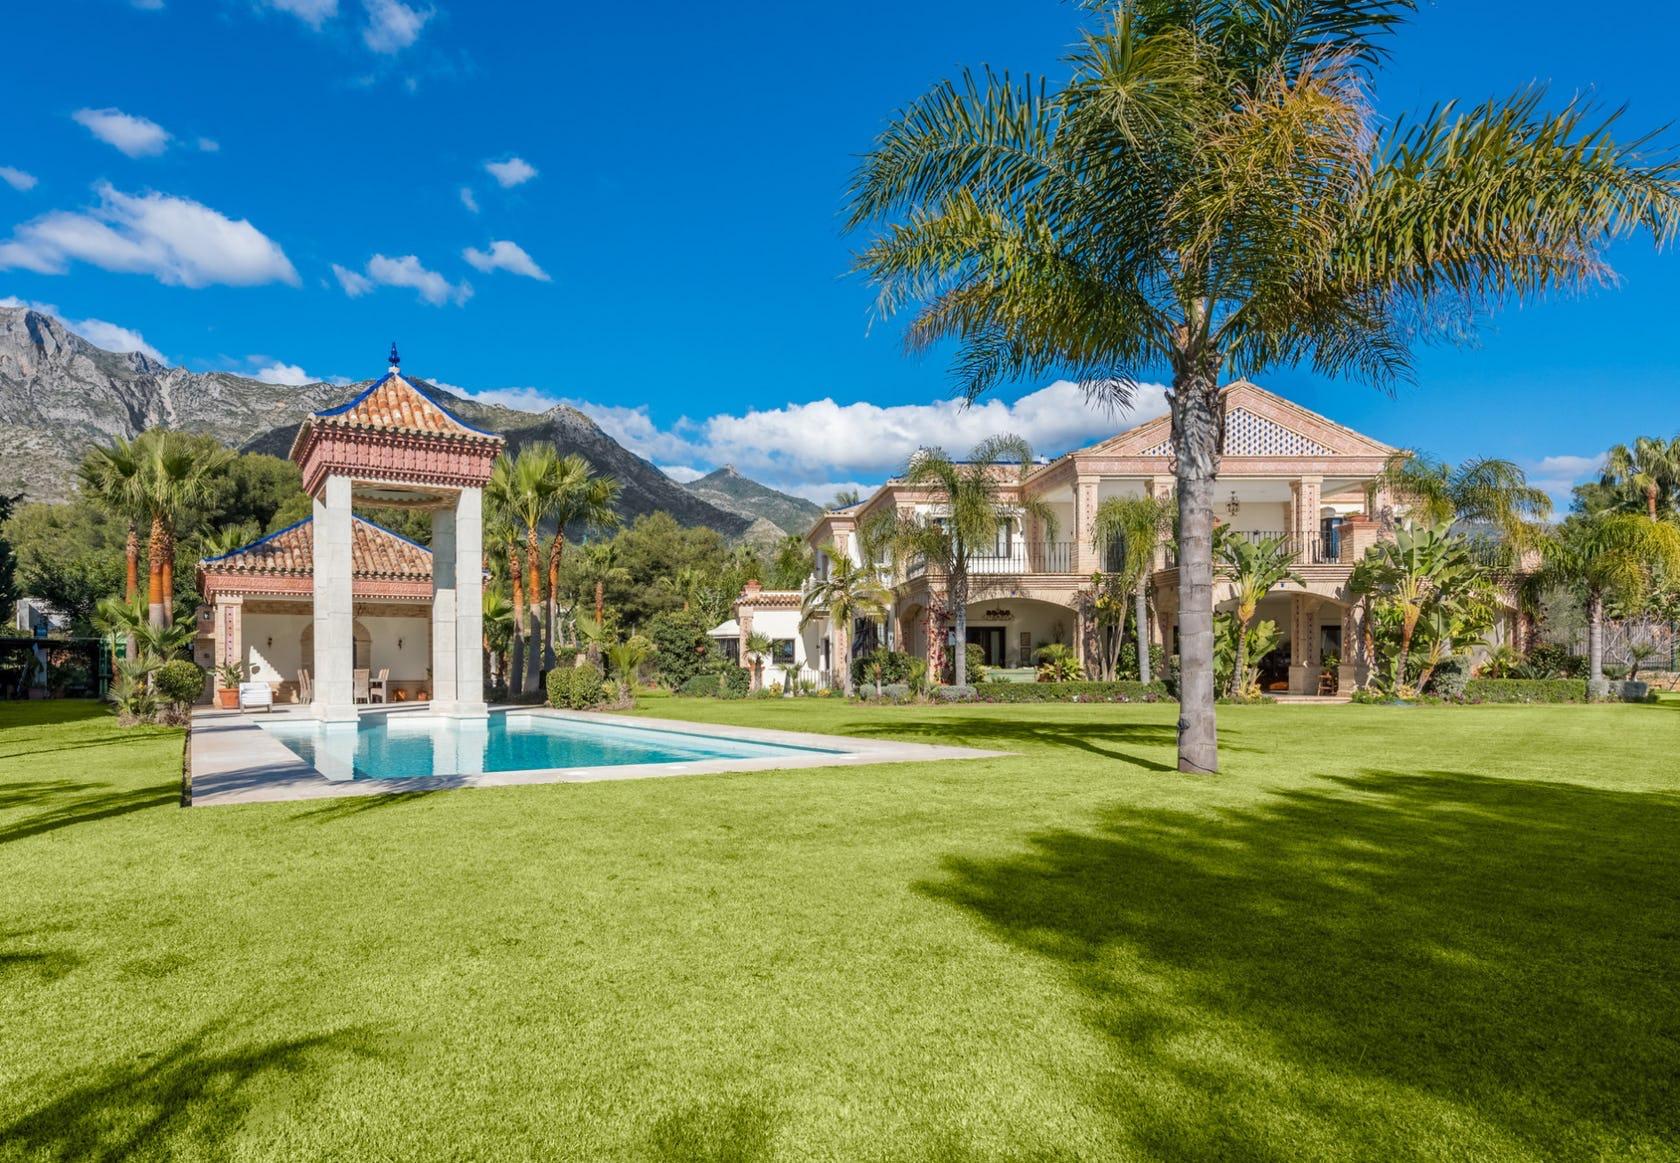 Investing in a villa in Sierra Blanca